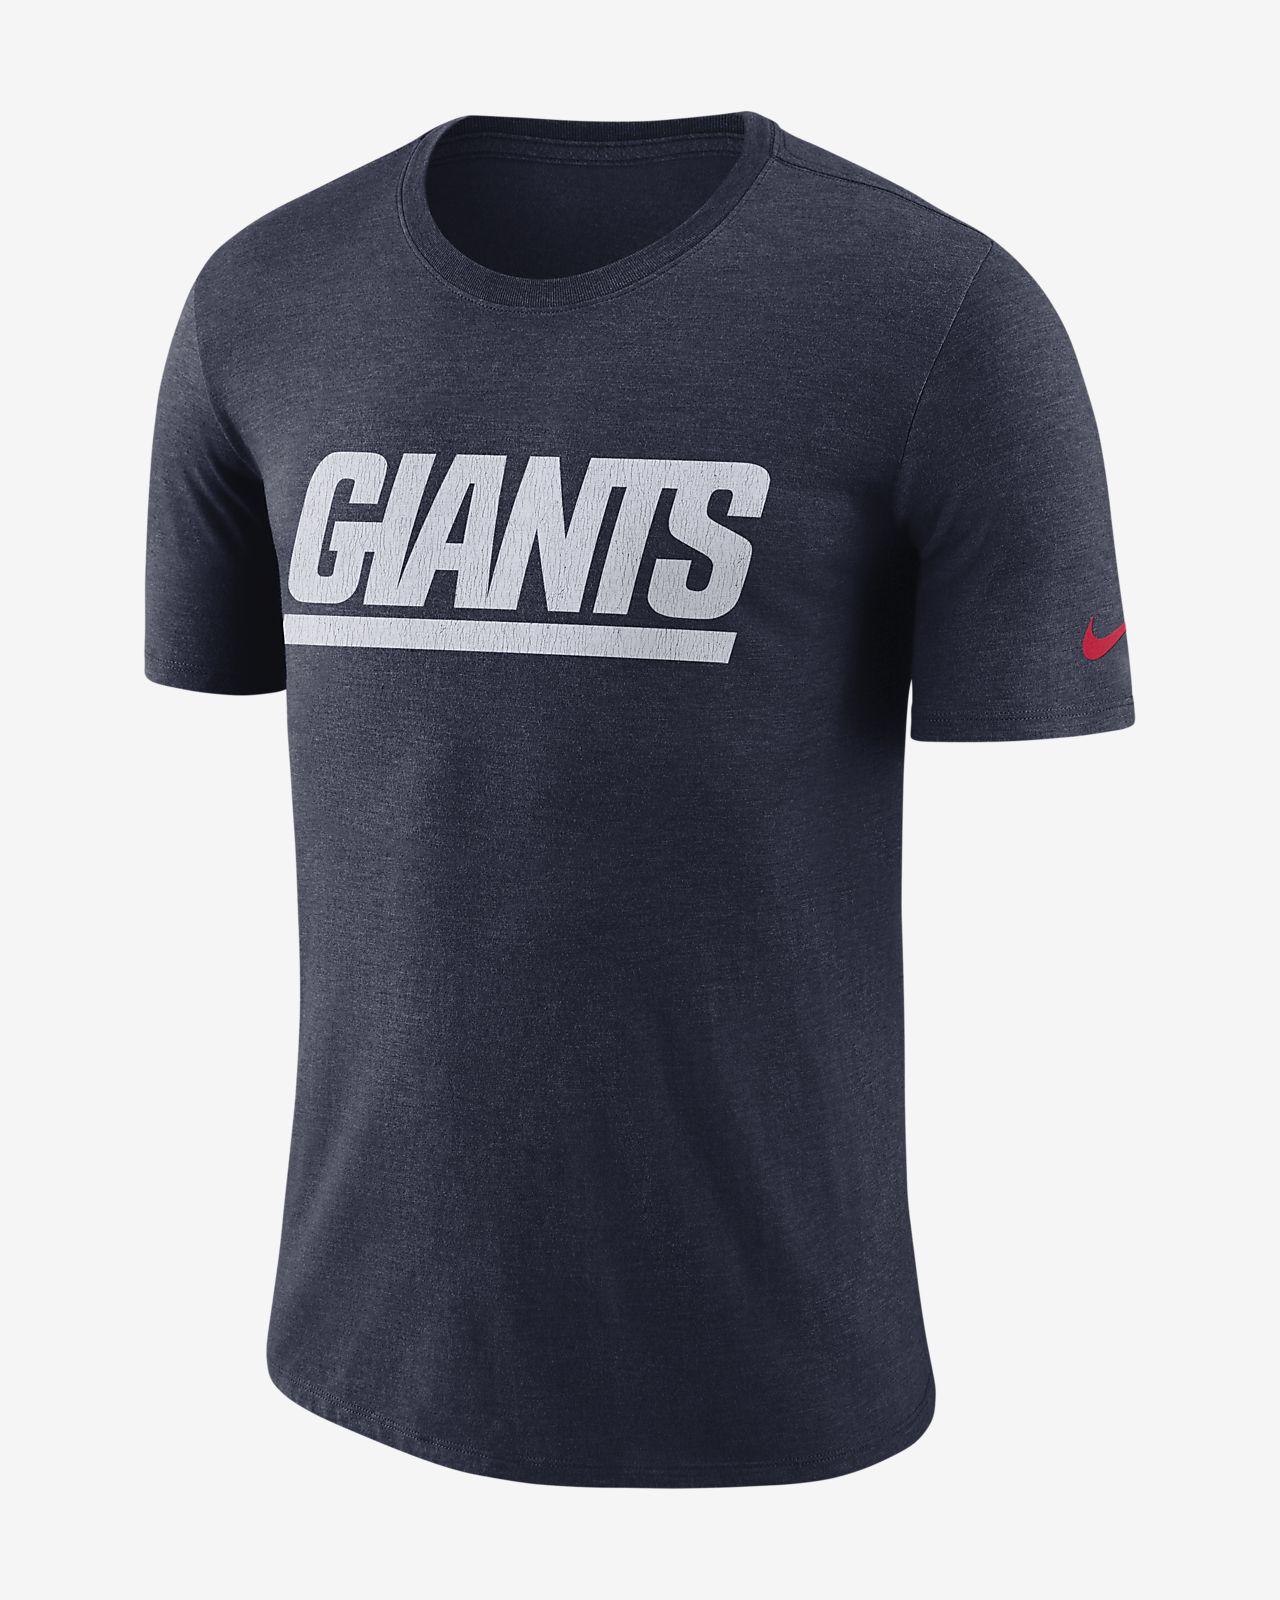 4d1b4beec Nike Historic Crackle (NFL Giants) Men s T-Shirt. Nike.com